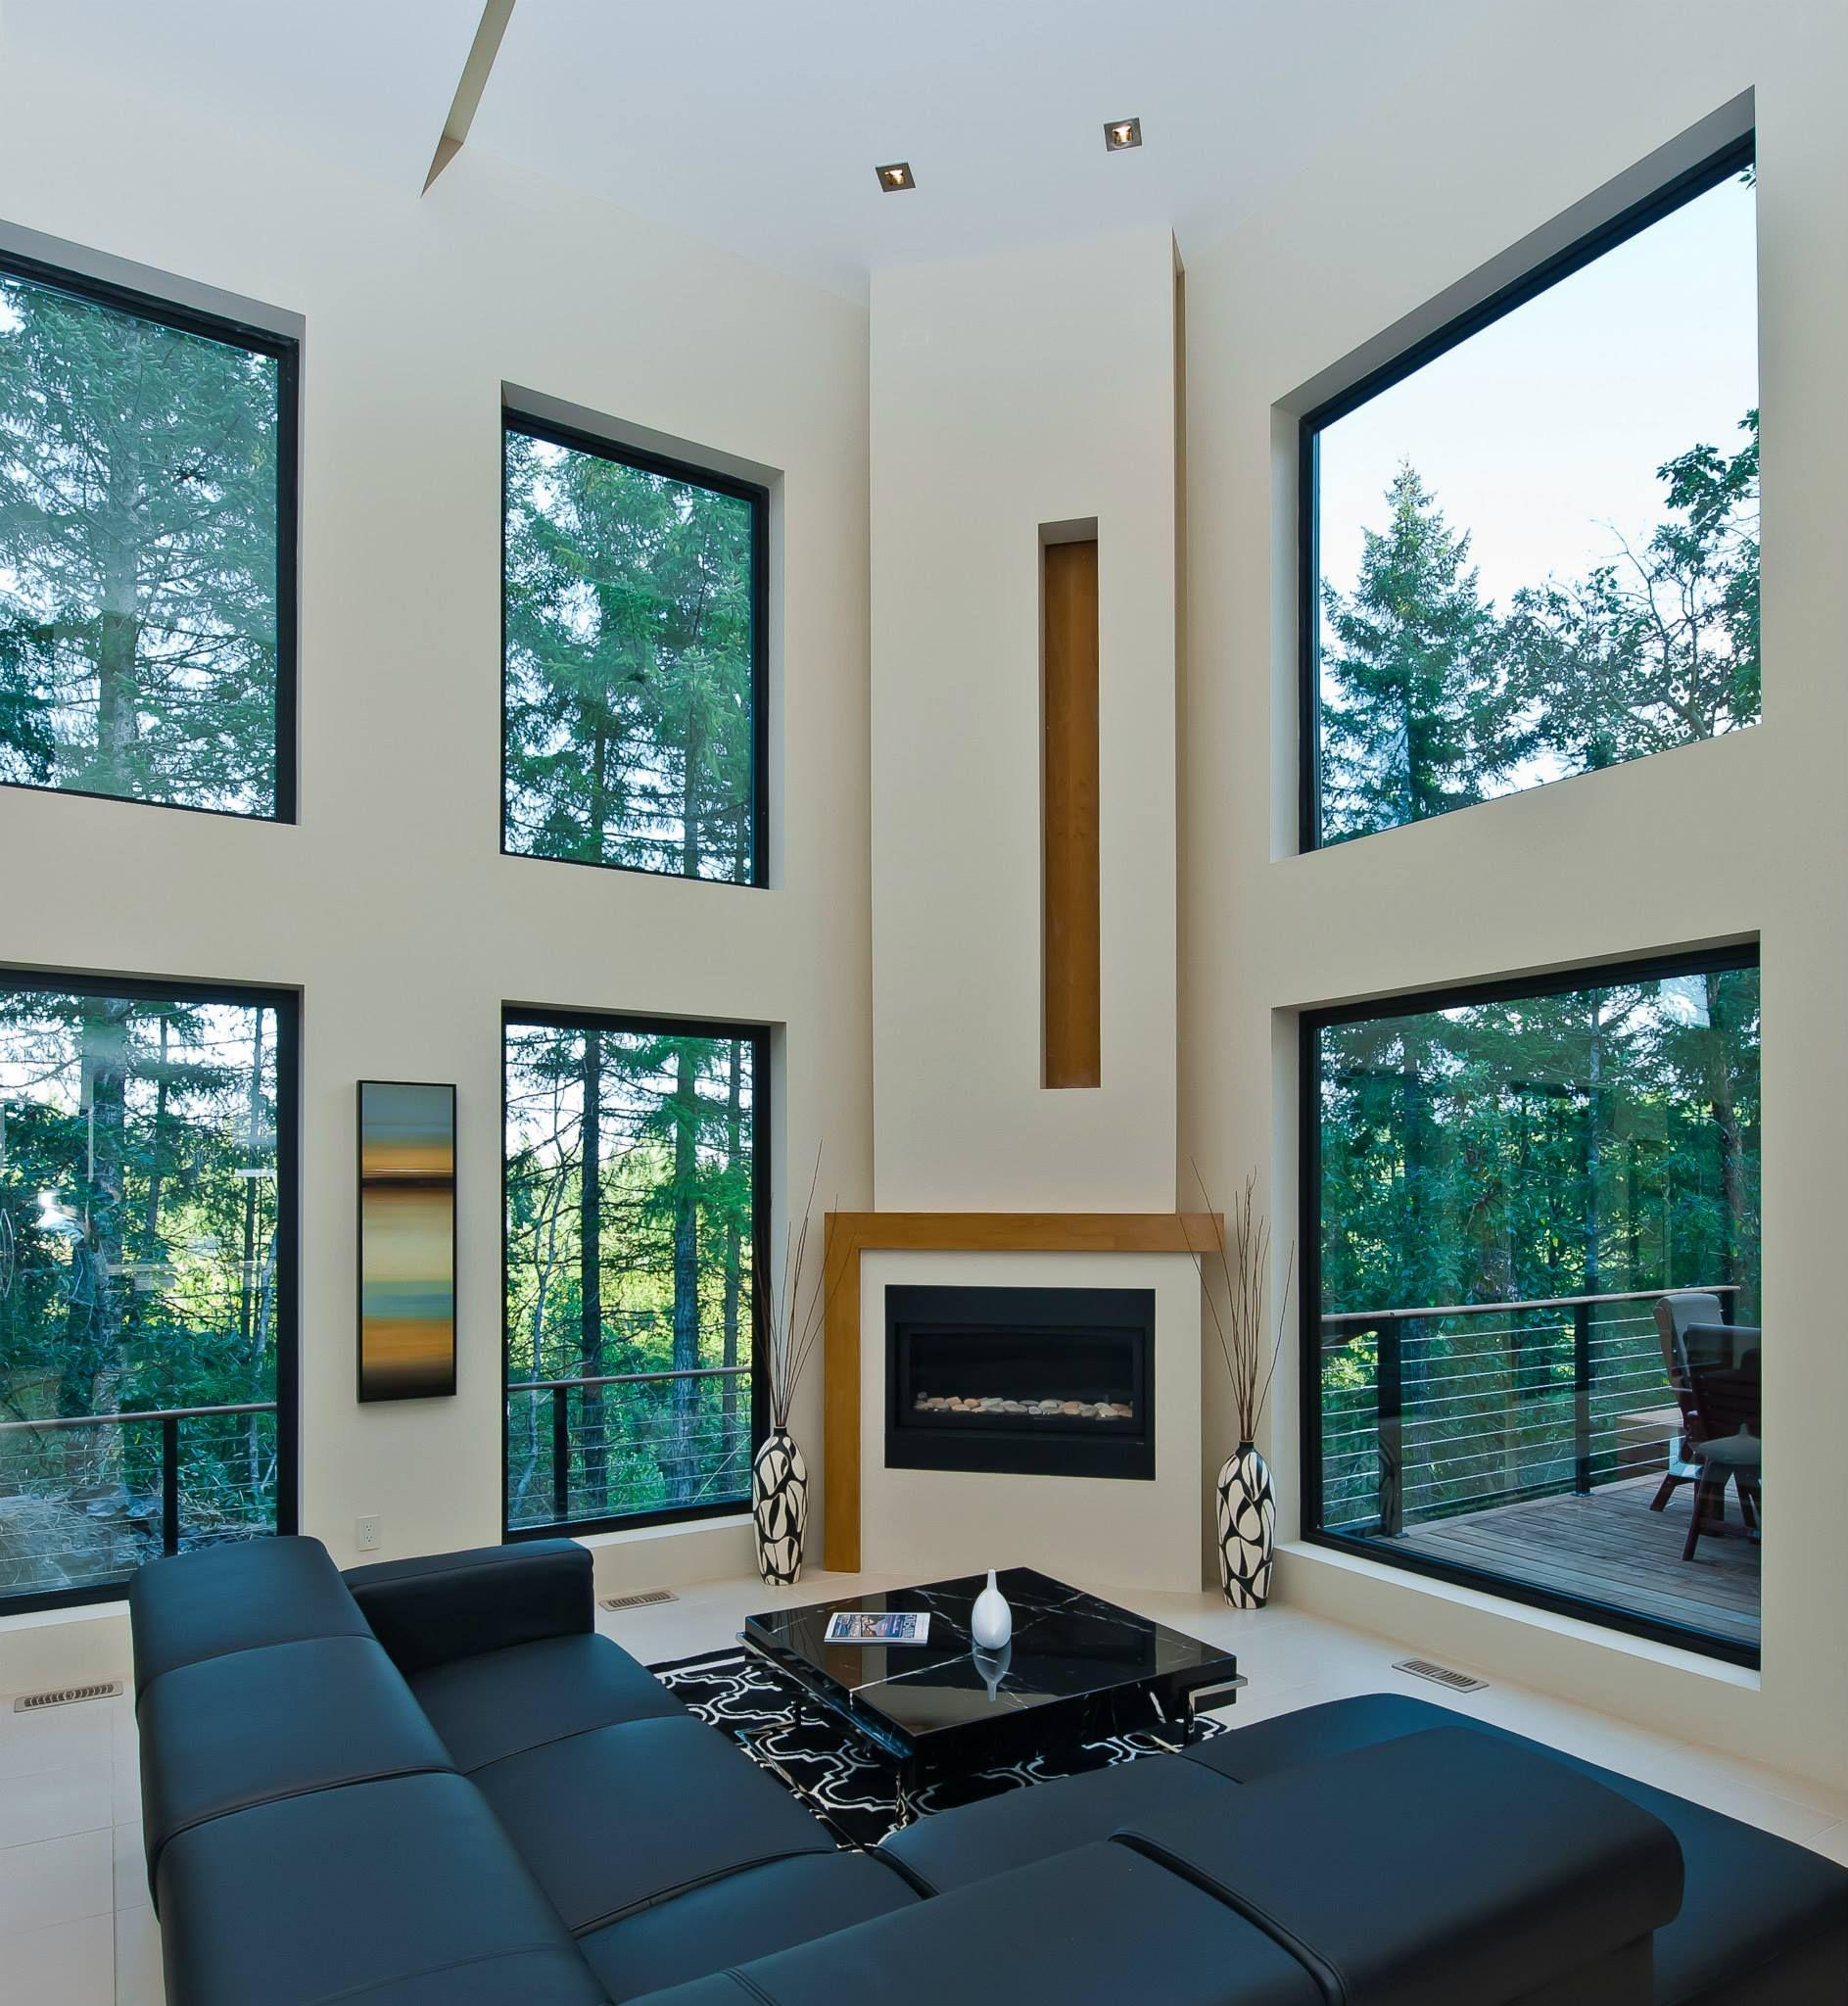 High Quality Alair Homes | Nanaimo | Custom Homes   Black Framed Casement Windows Invite  Natural Light